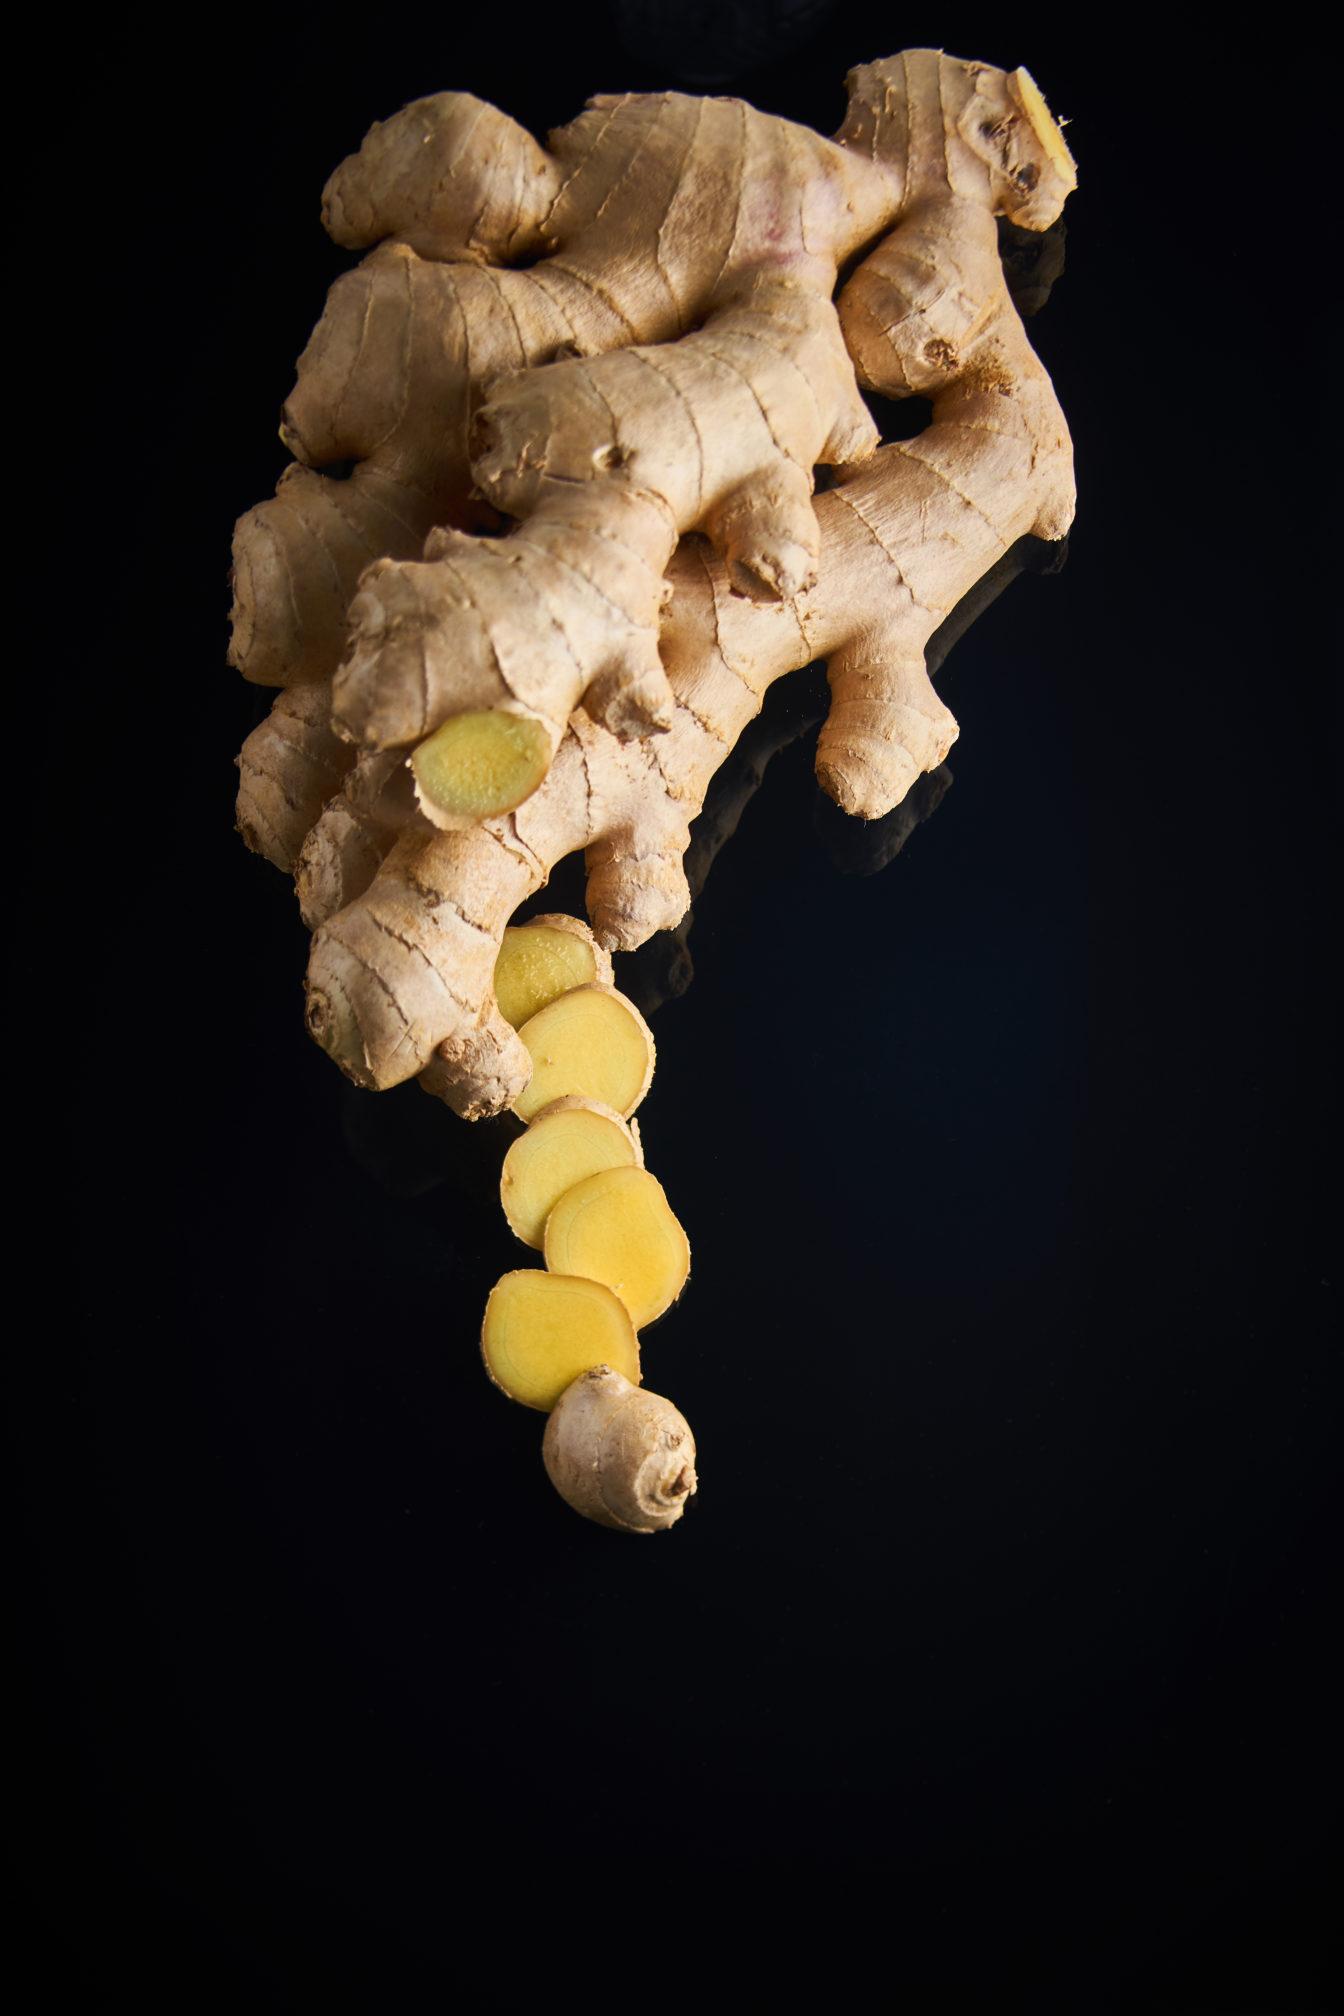 capexo-lilot-fruits-exotique-gingembre